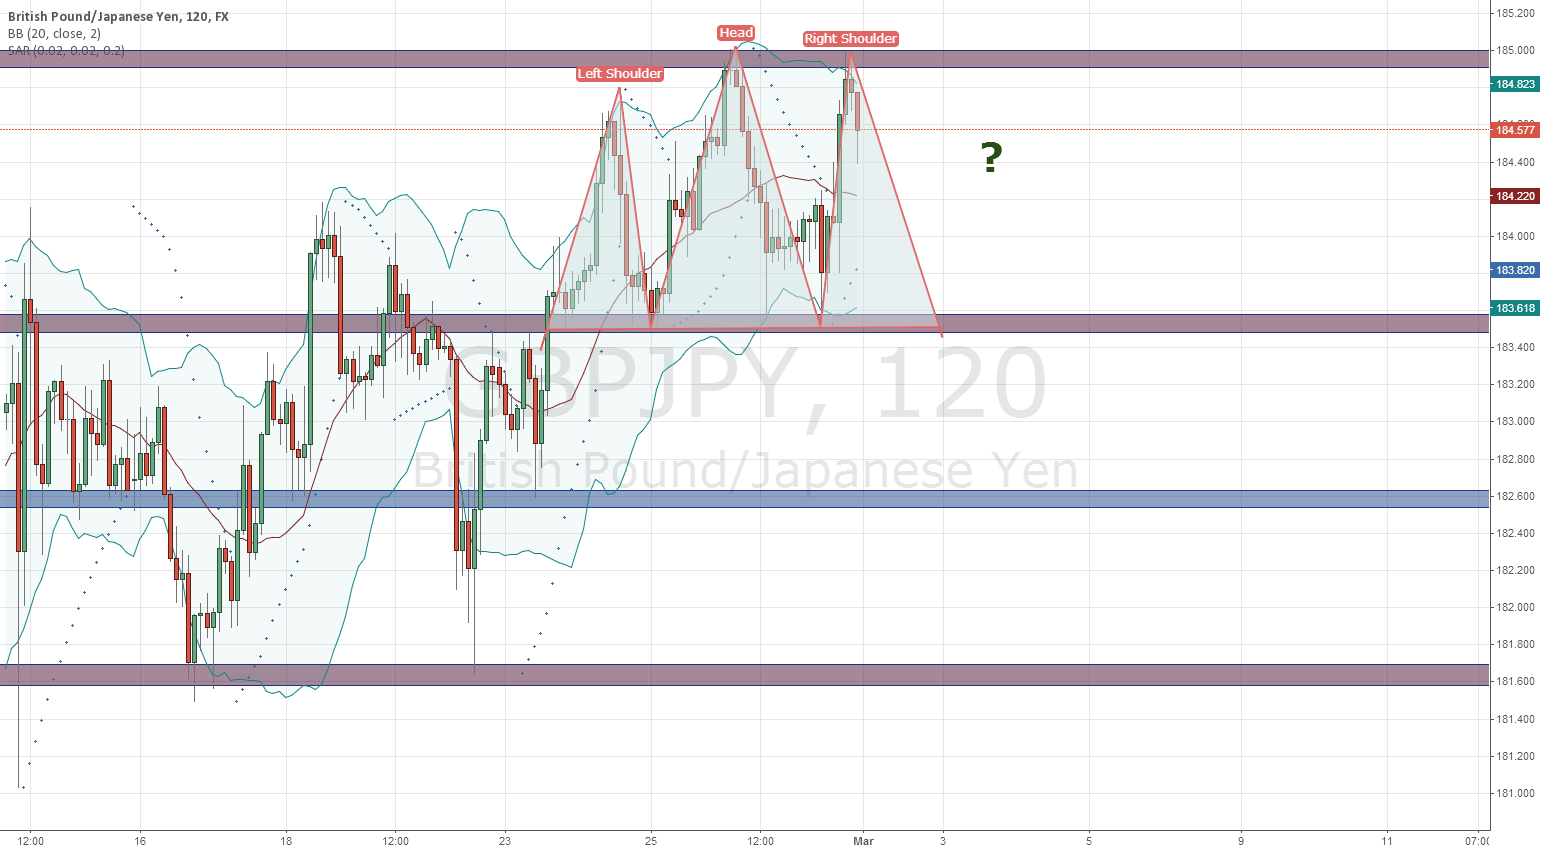 H&S GBP/JPY 120